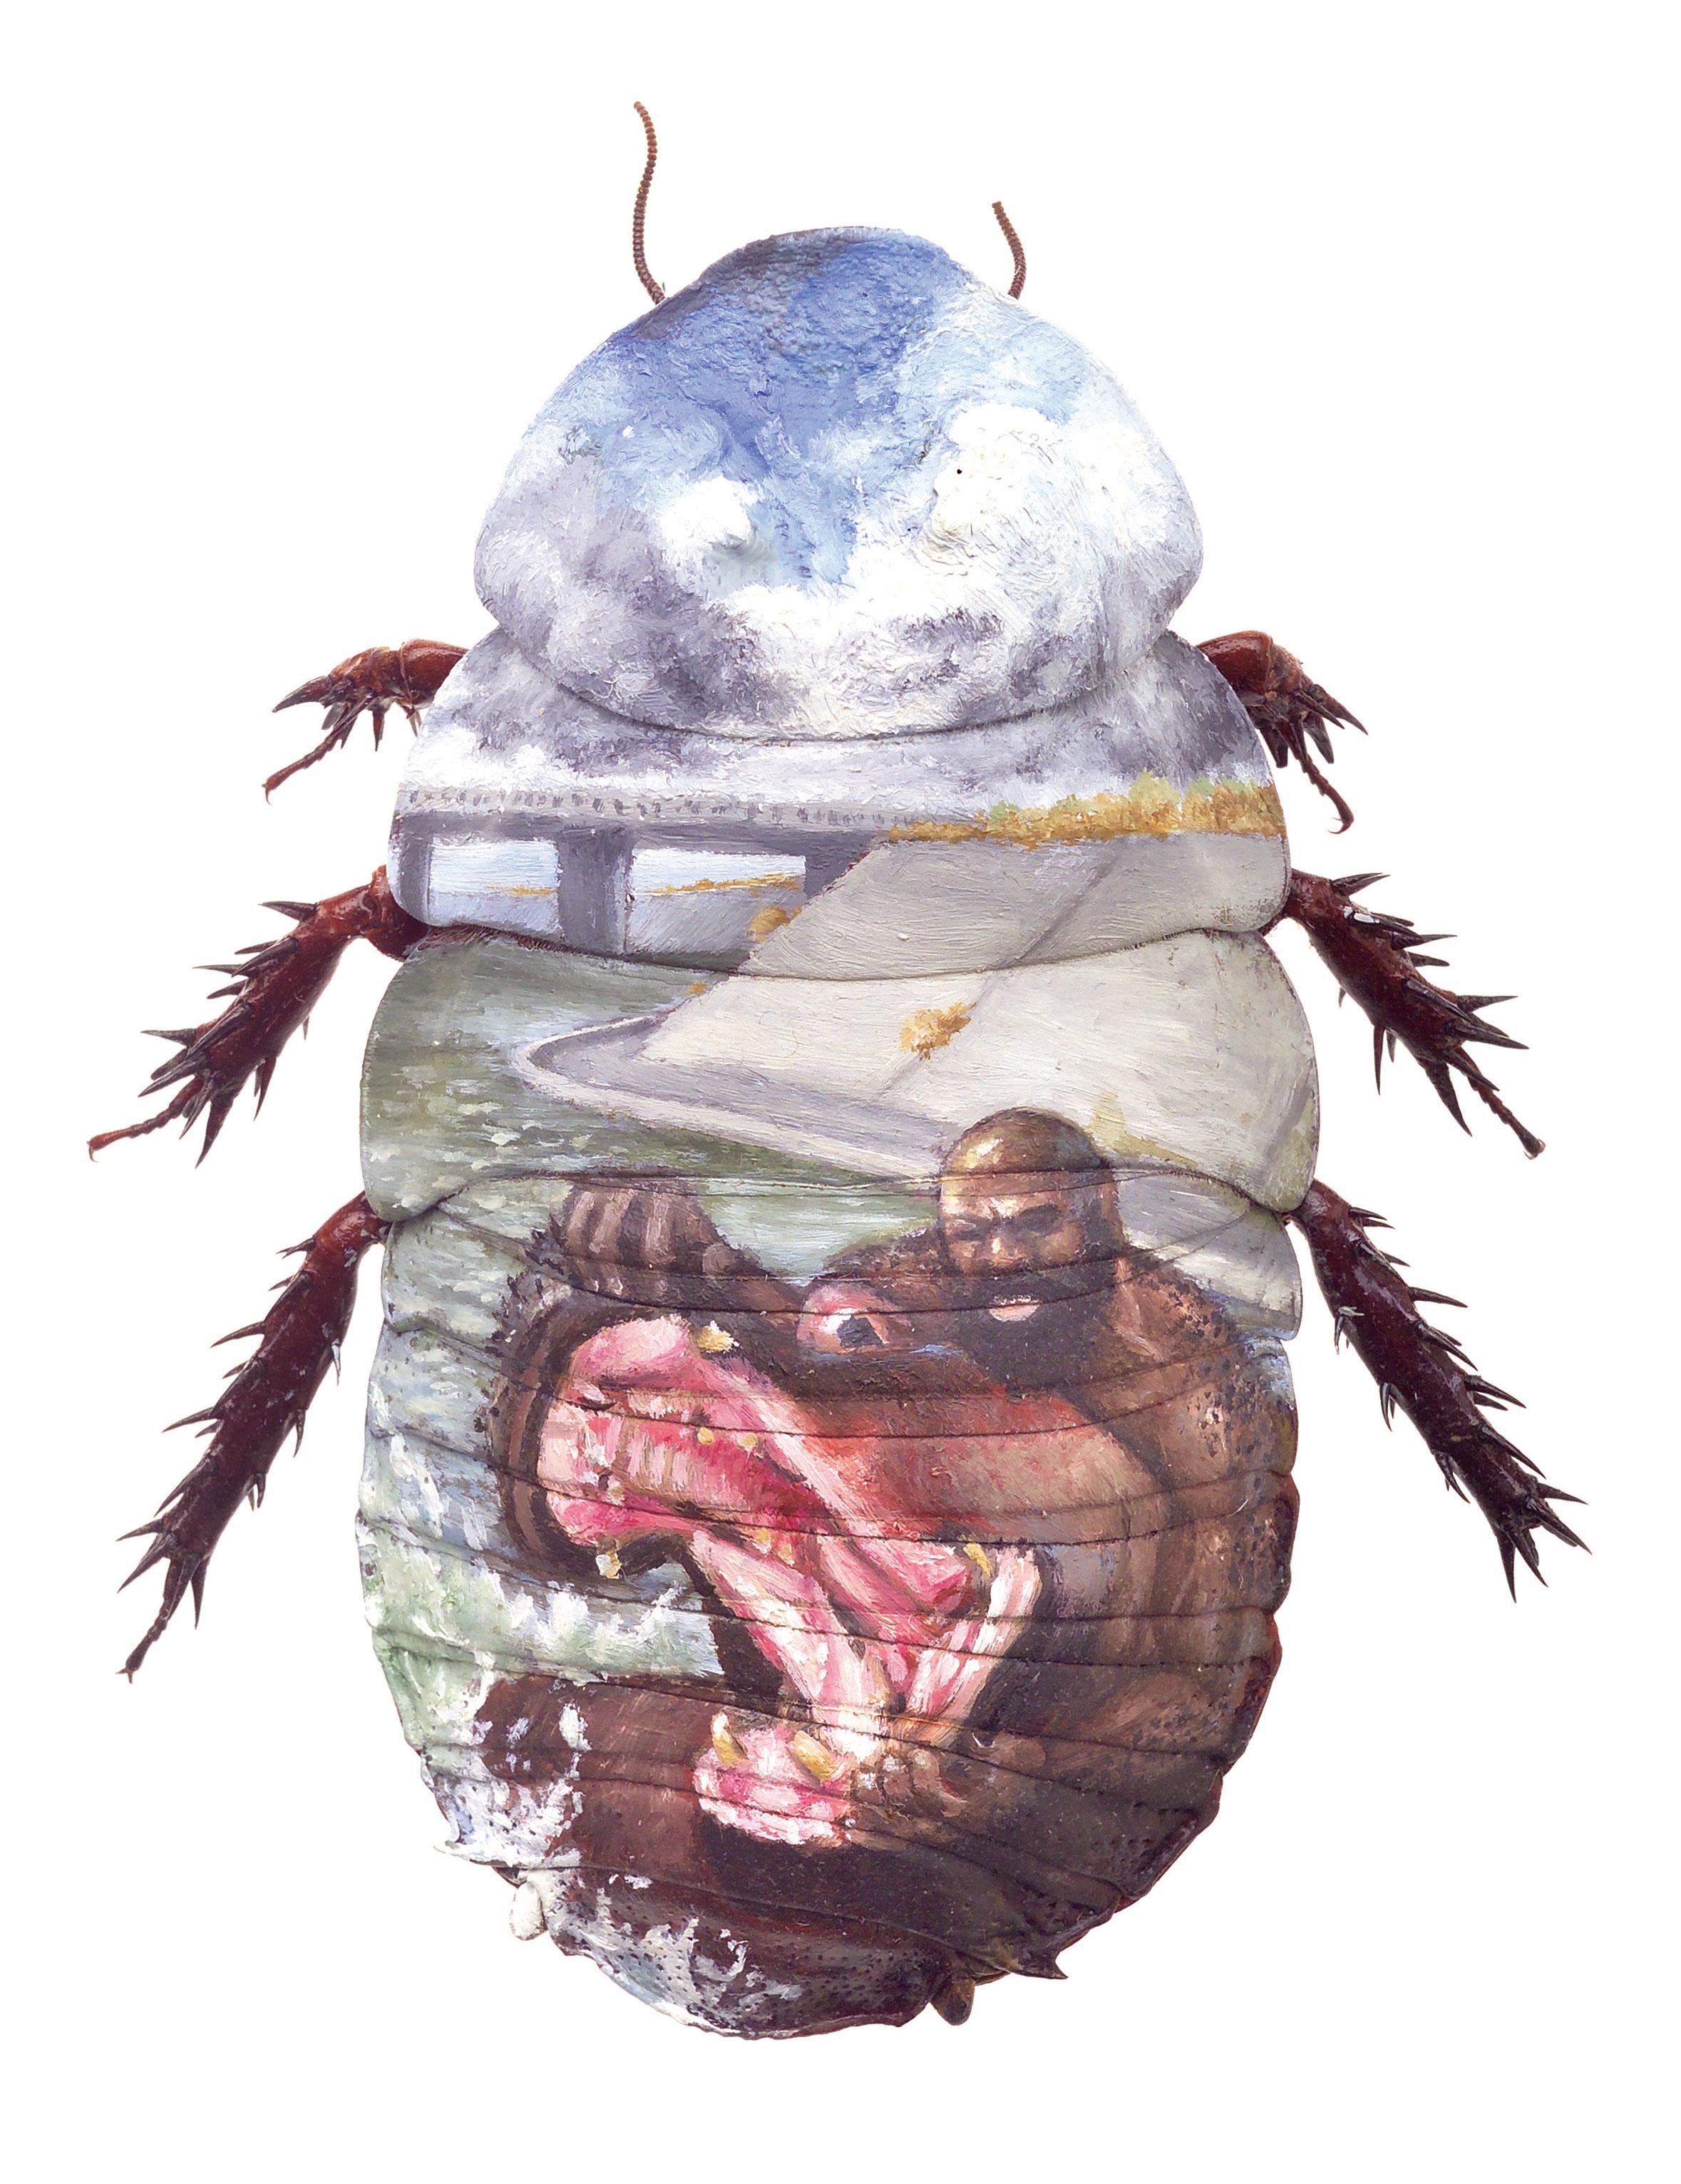 "Evan Skrederstu & Christopher Brand. Kimbo versus the River. 2007 - oil on roach. 3"" x 1.5""."